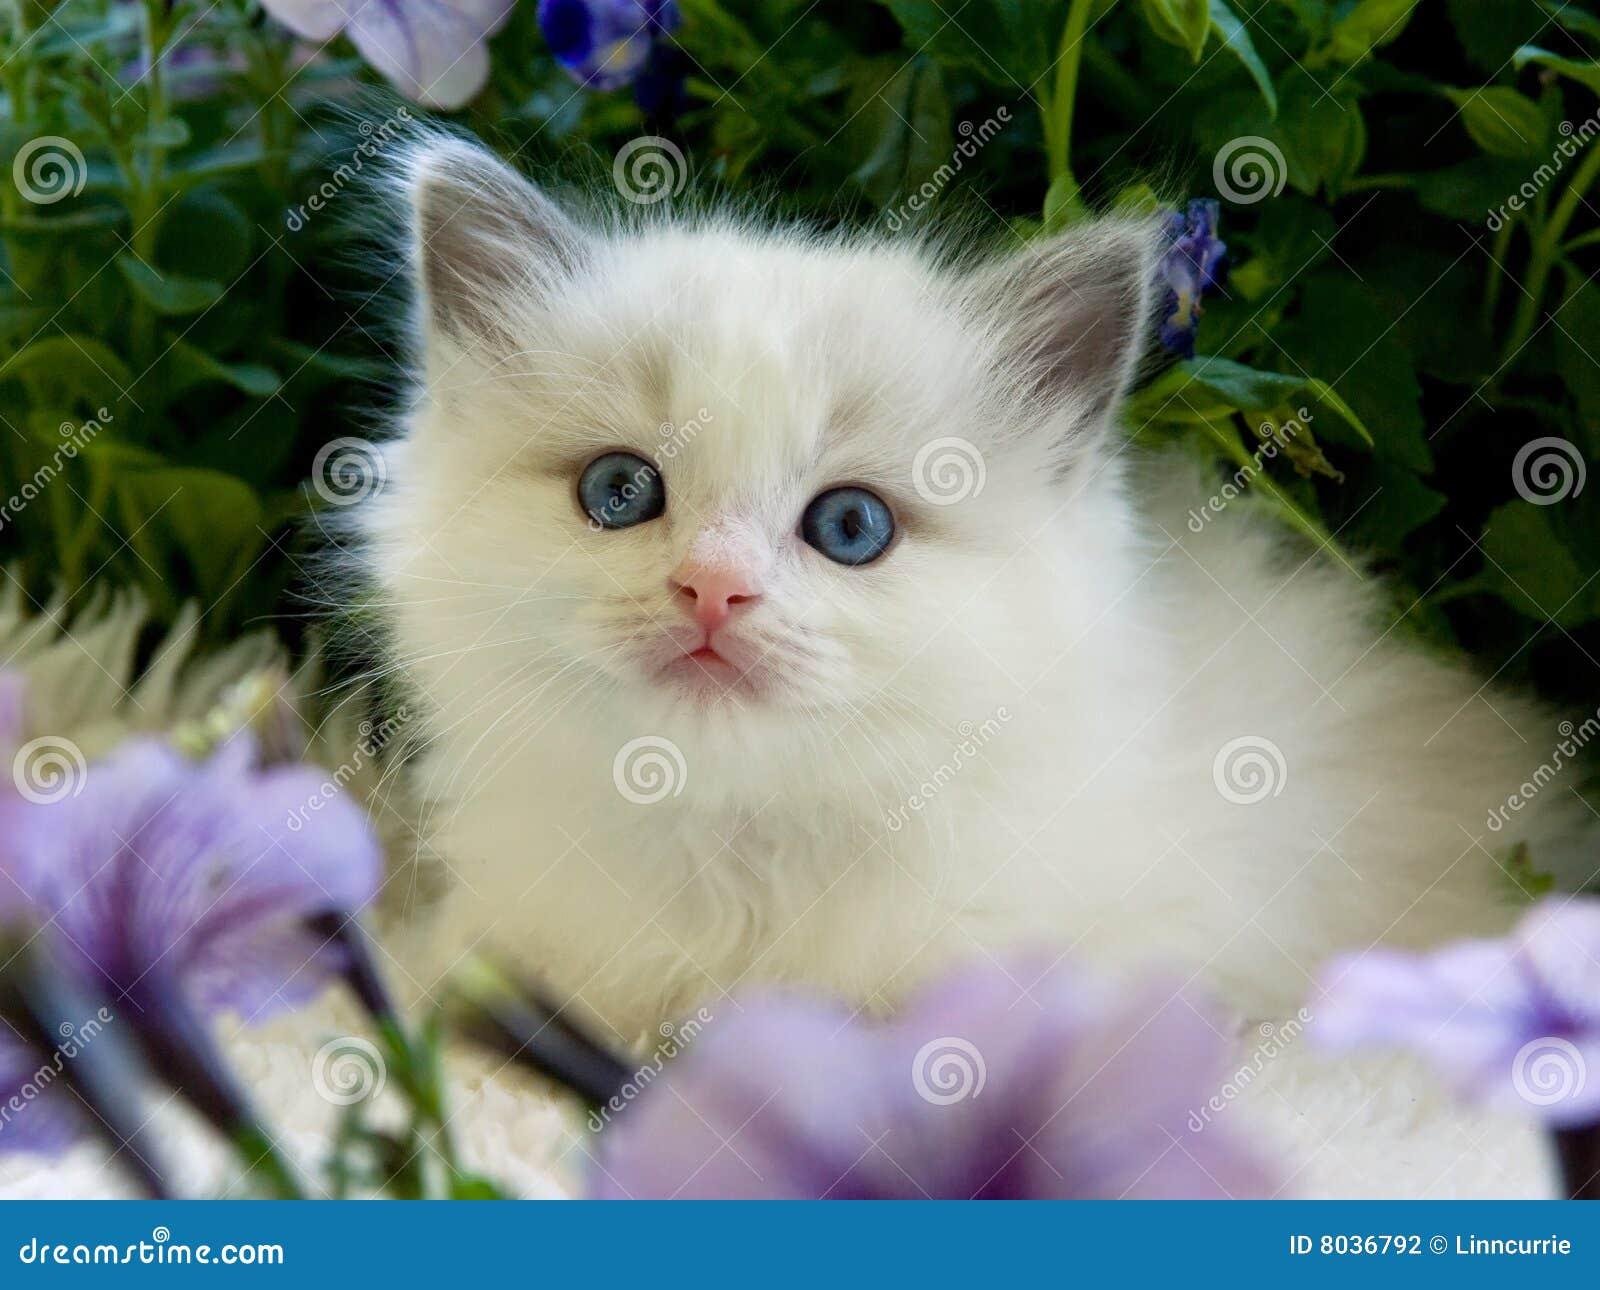 Cute pretty Ragdoll kitten with petunias